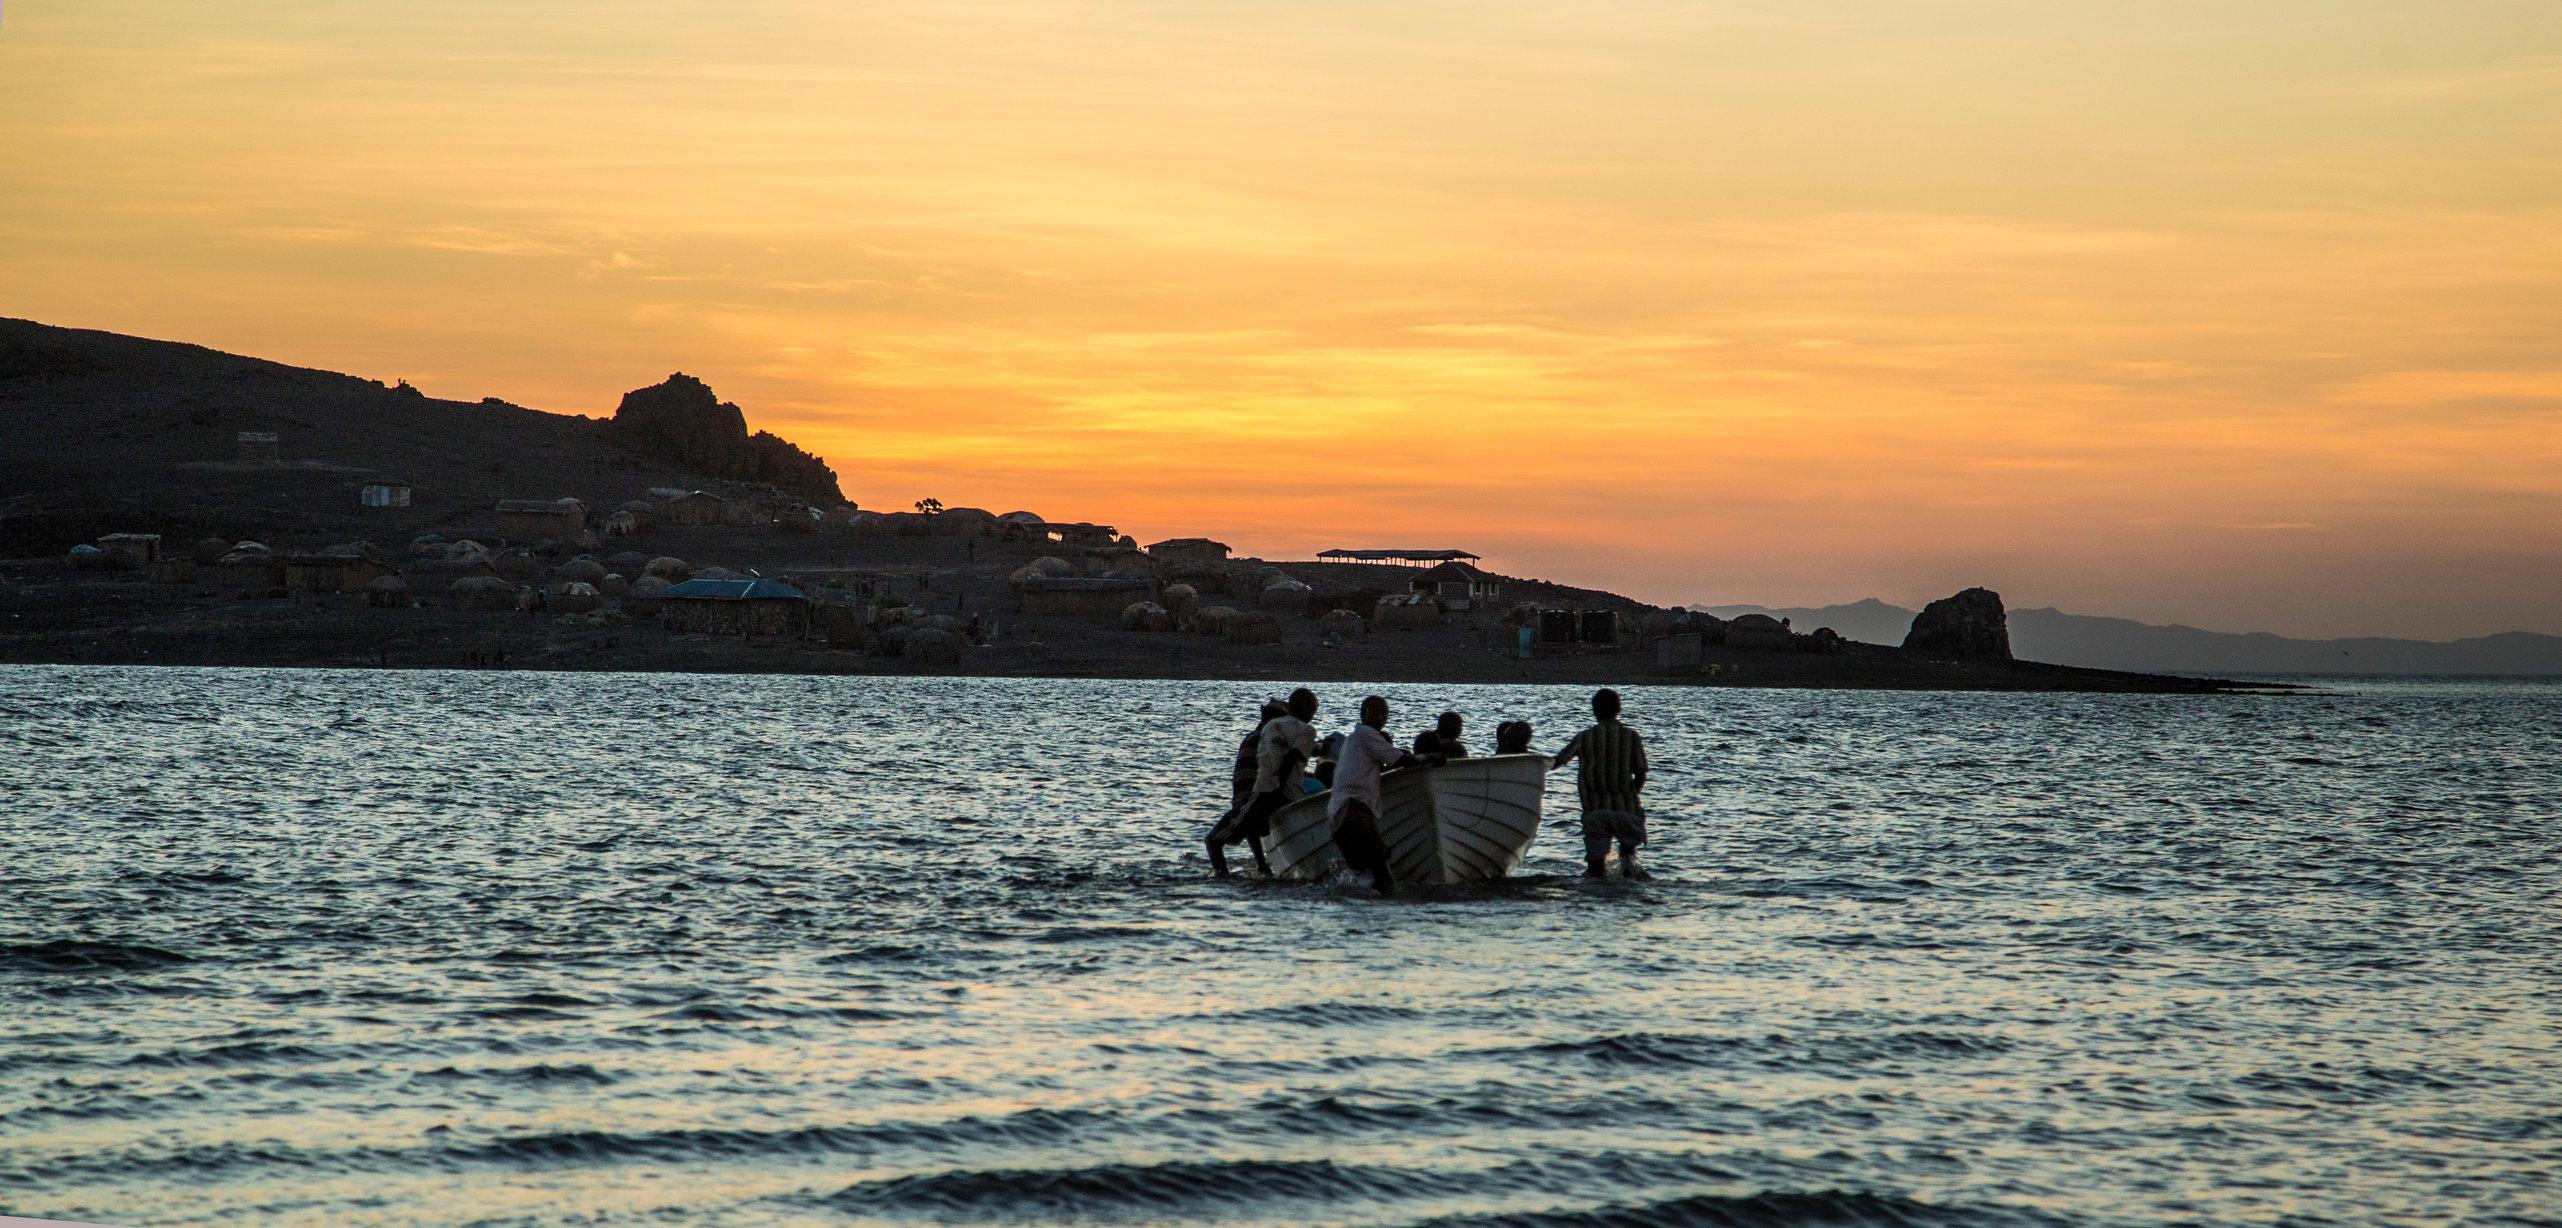 Heading home before dark - El Molo Island on Lake Turkana